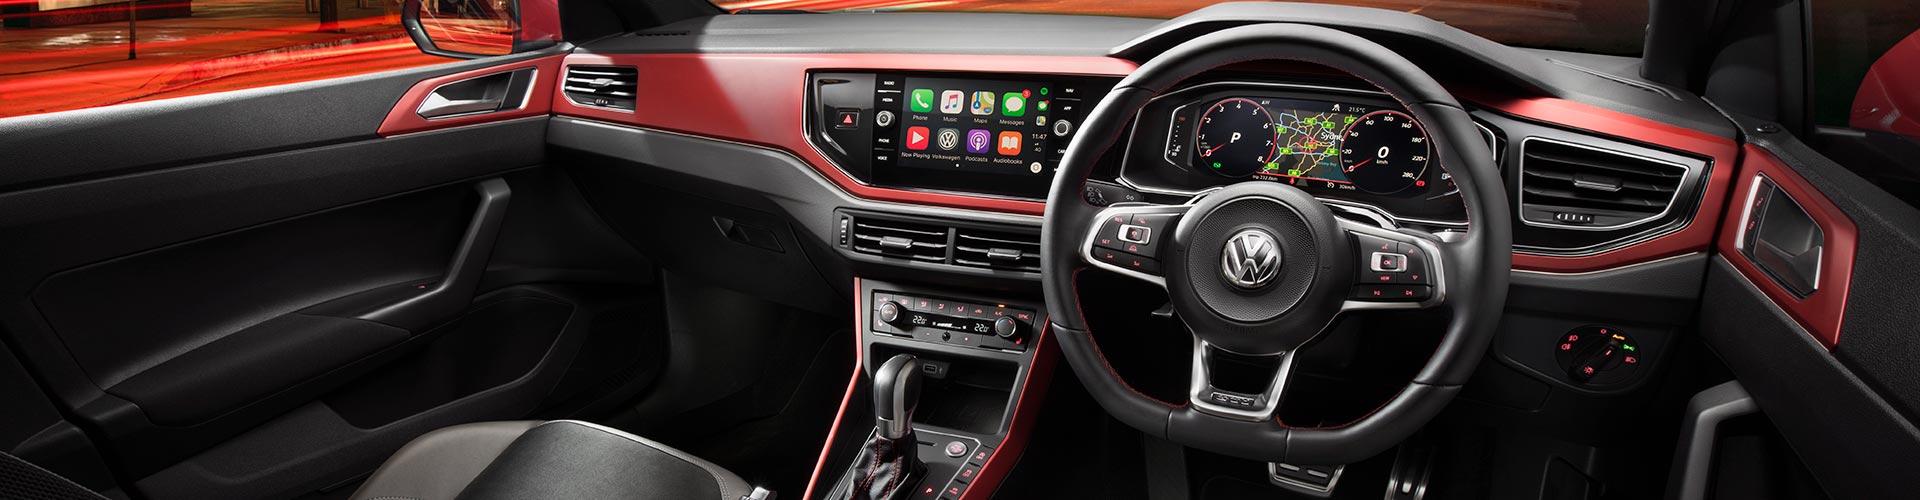 Volkswagen GTI Dash